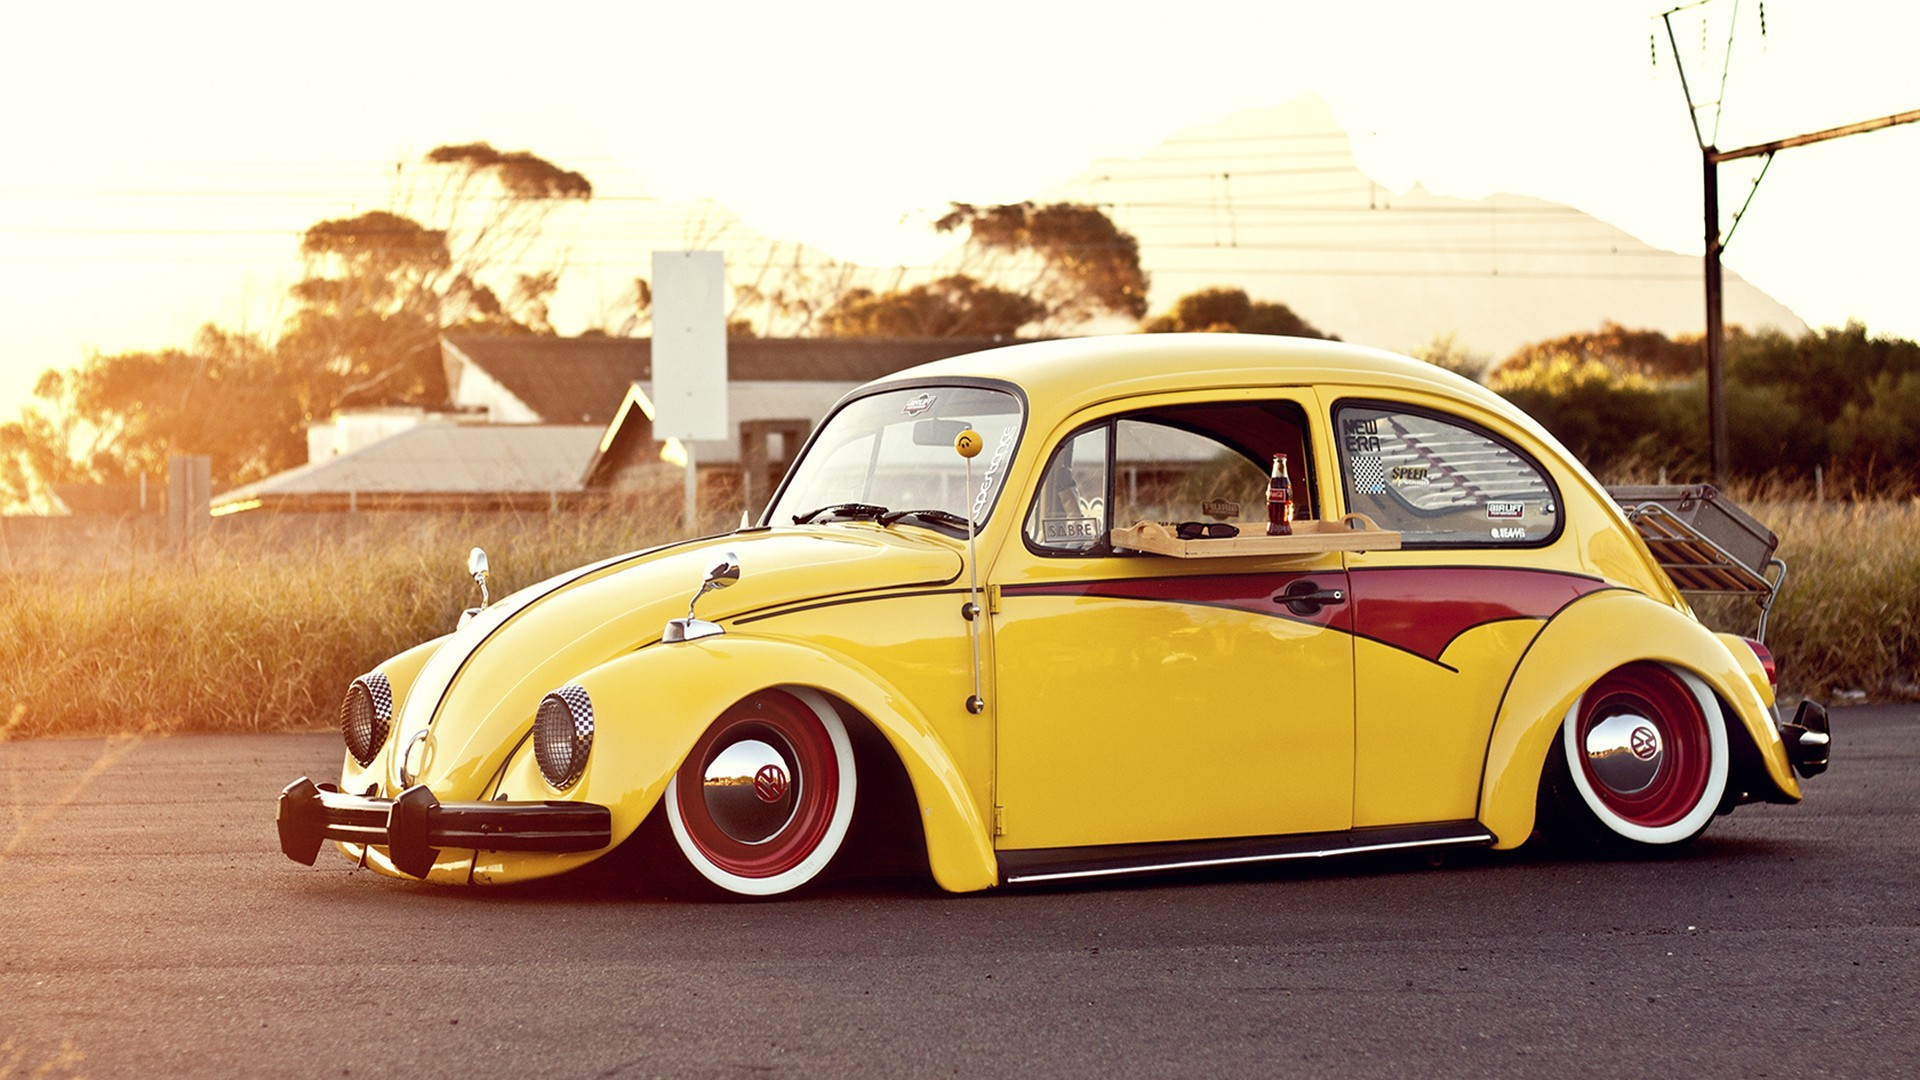 Volkswagen Beetle Wallpaper High Quality Resolution #TDL